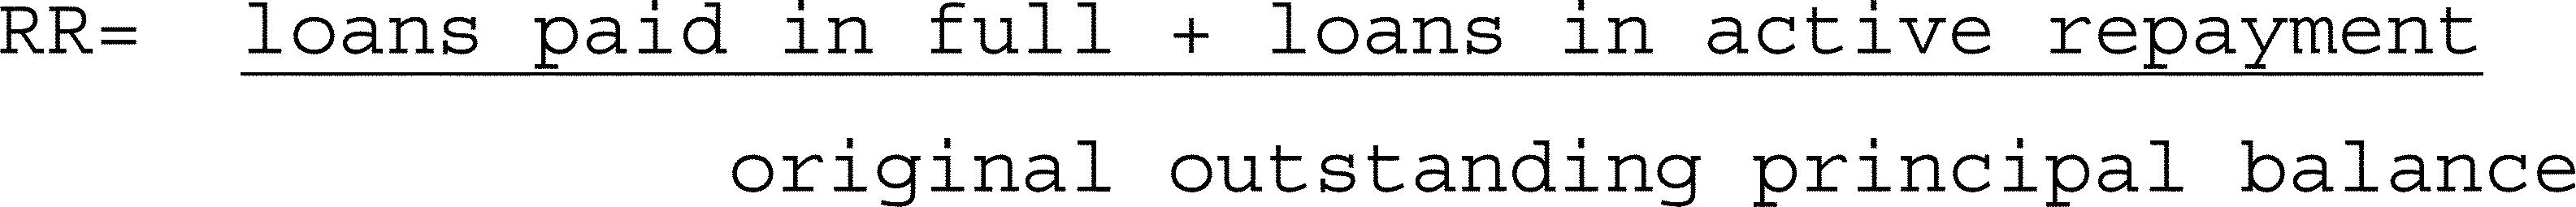 Abbotsford payday loans image 9